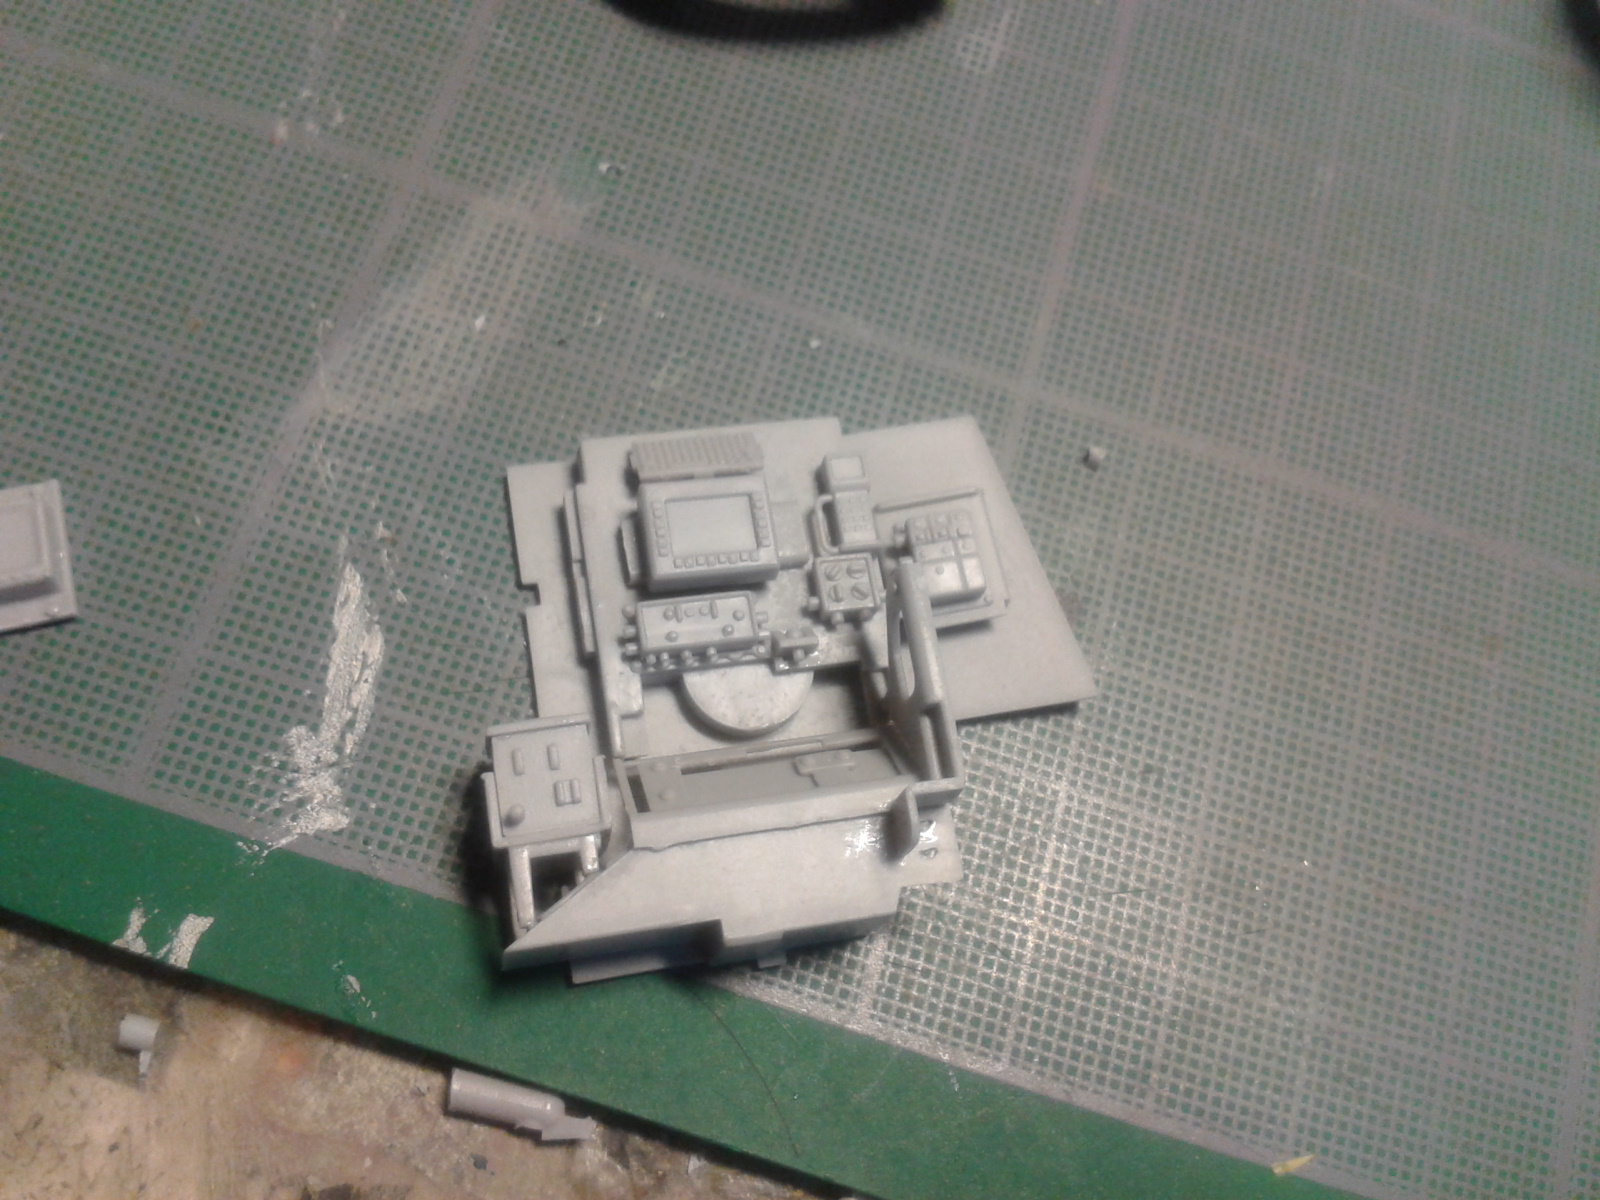 Stryker M1129 Mortar Carrier MC-B ...Montage terminé !!!! 20130415192833